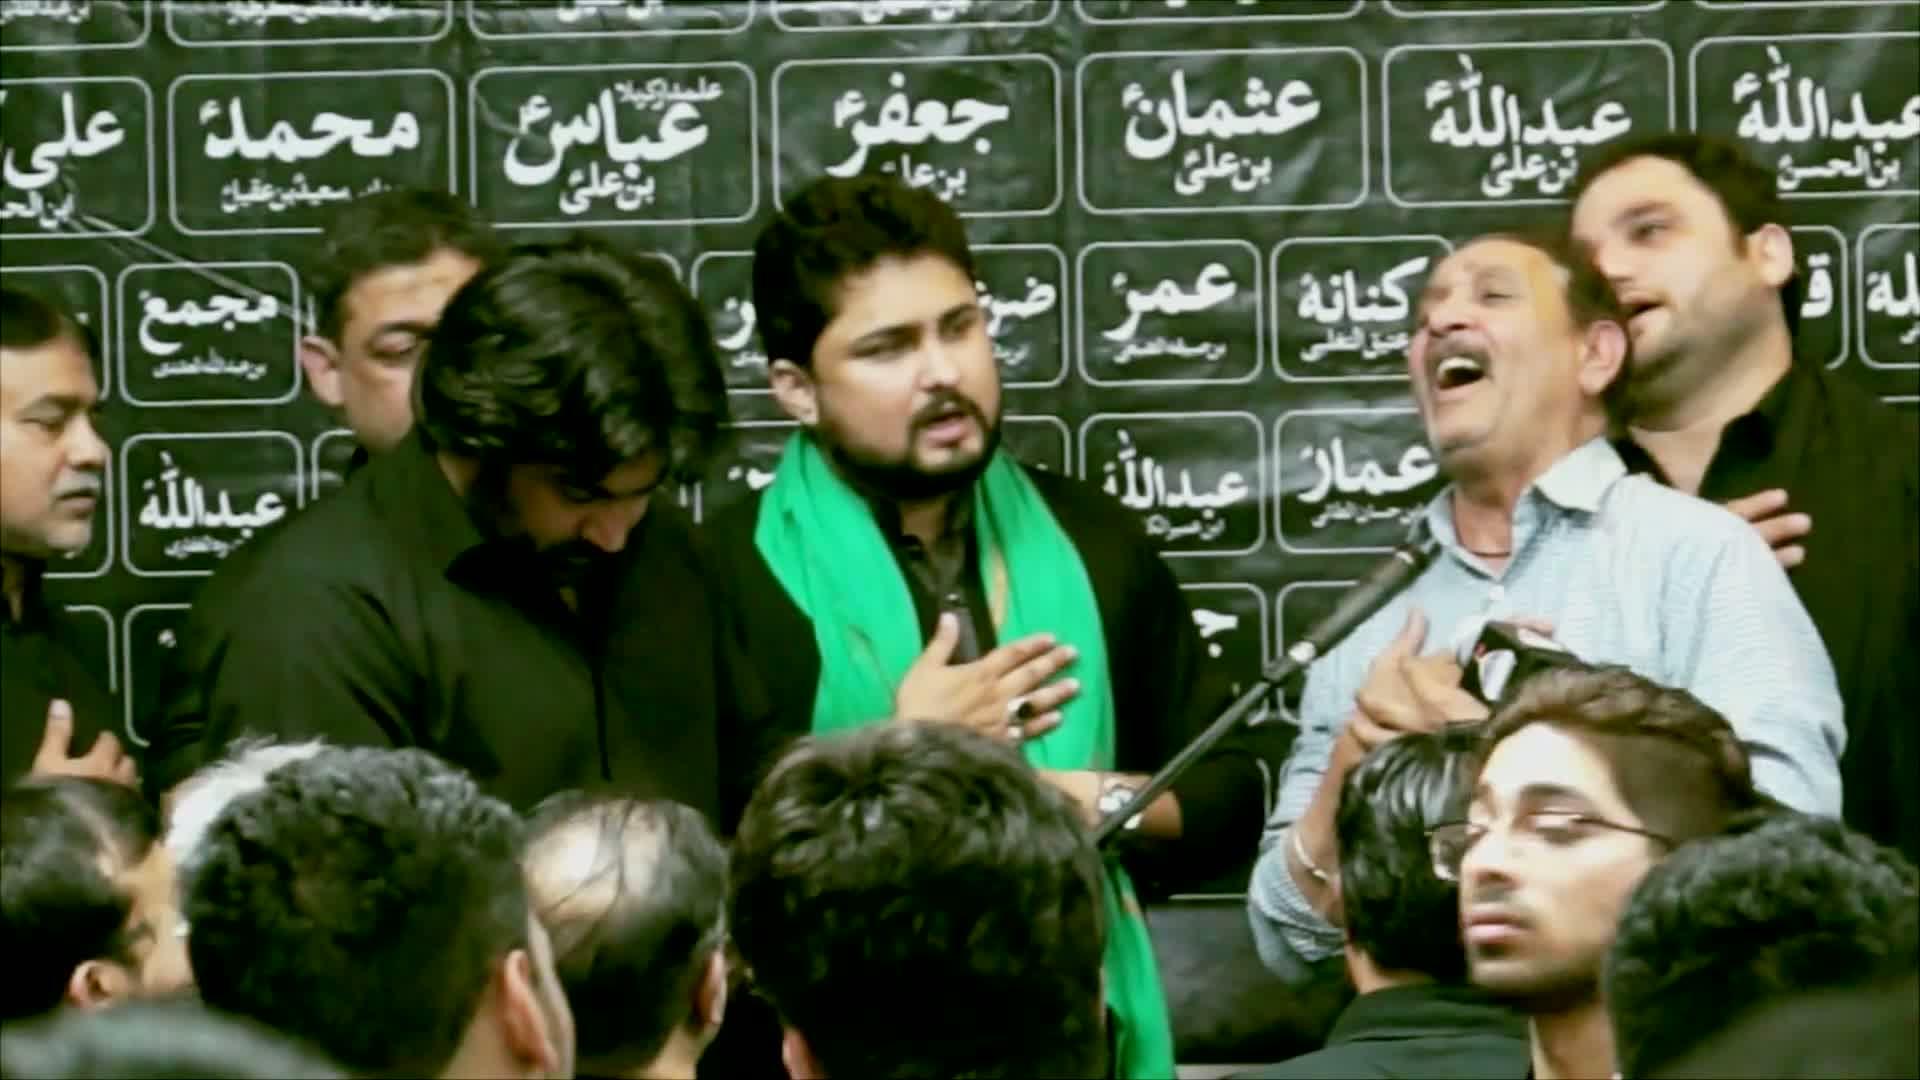 Asghar Haye Asghar  Ali Zia Rizvi  AZH25 Shabedari  Idara e Jaferia